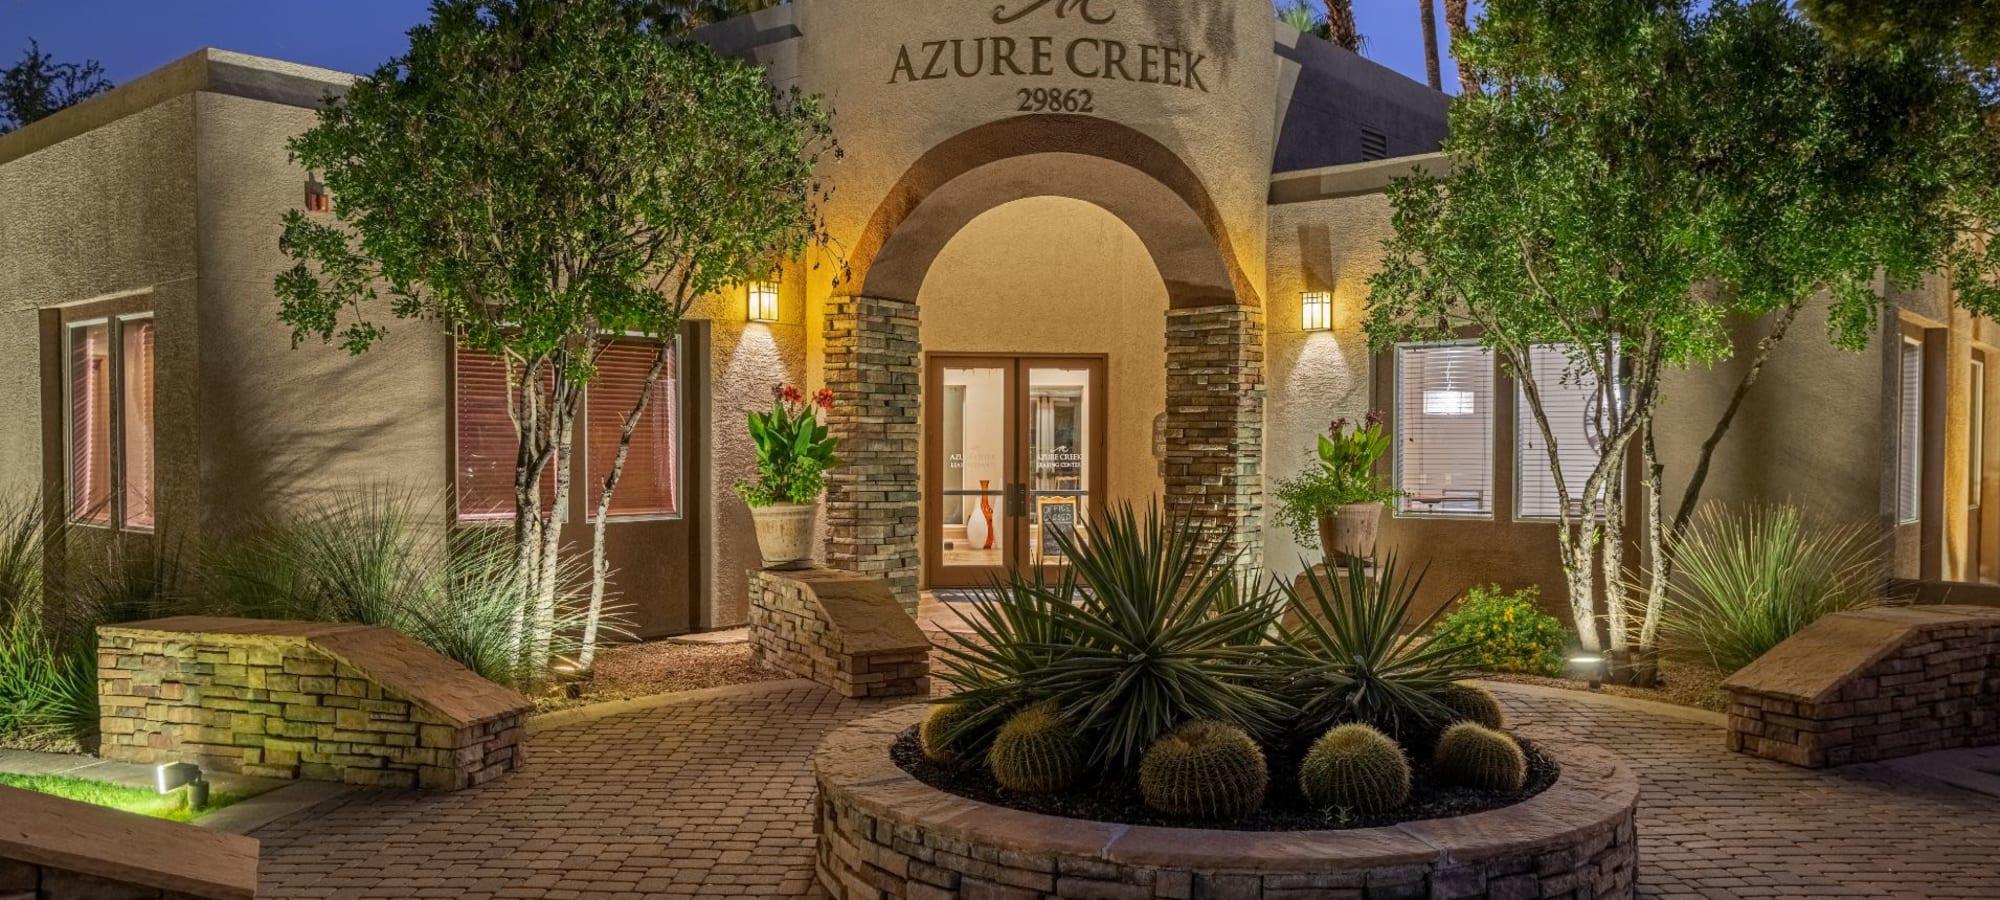 Virtual tours of Azure Creek in Cave Creek, Arizona